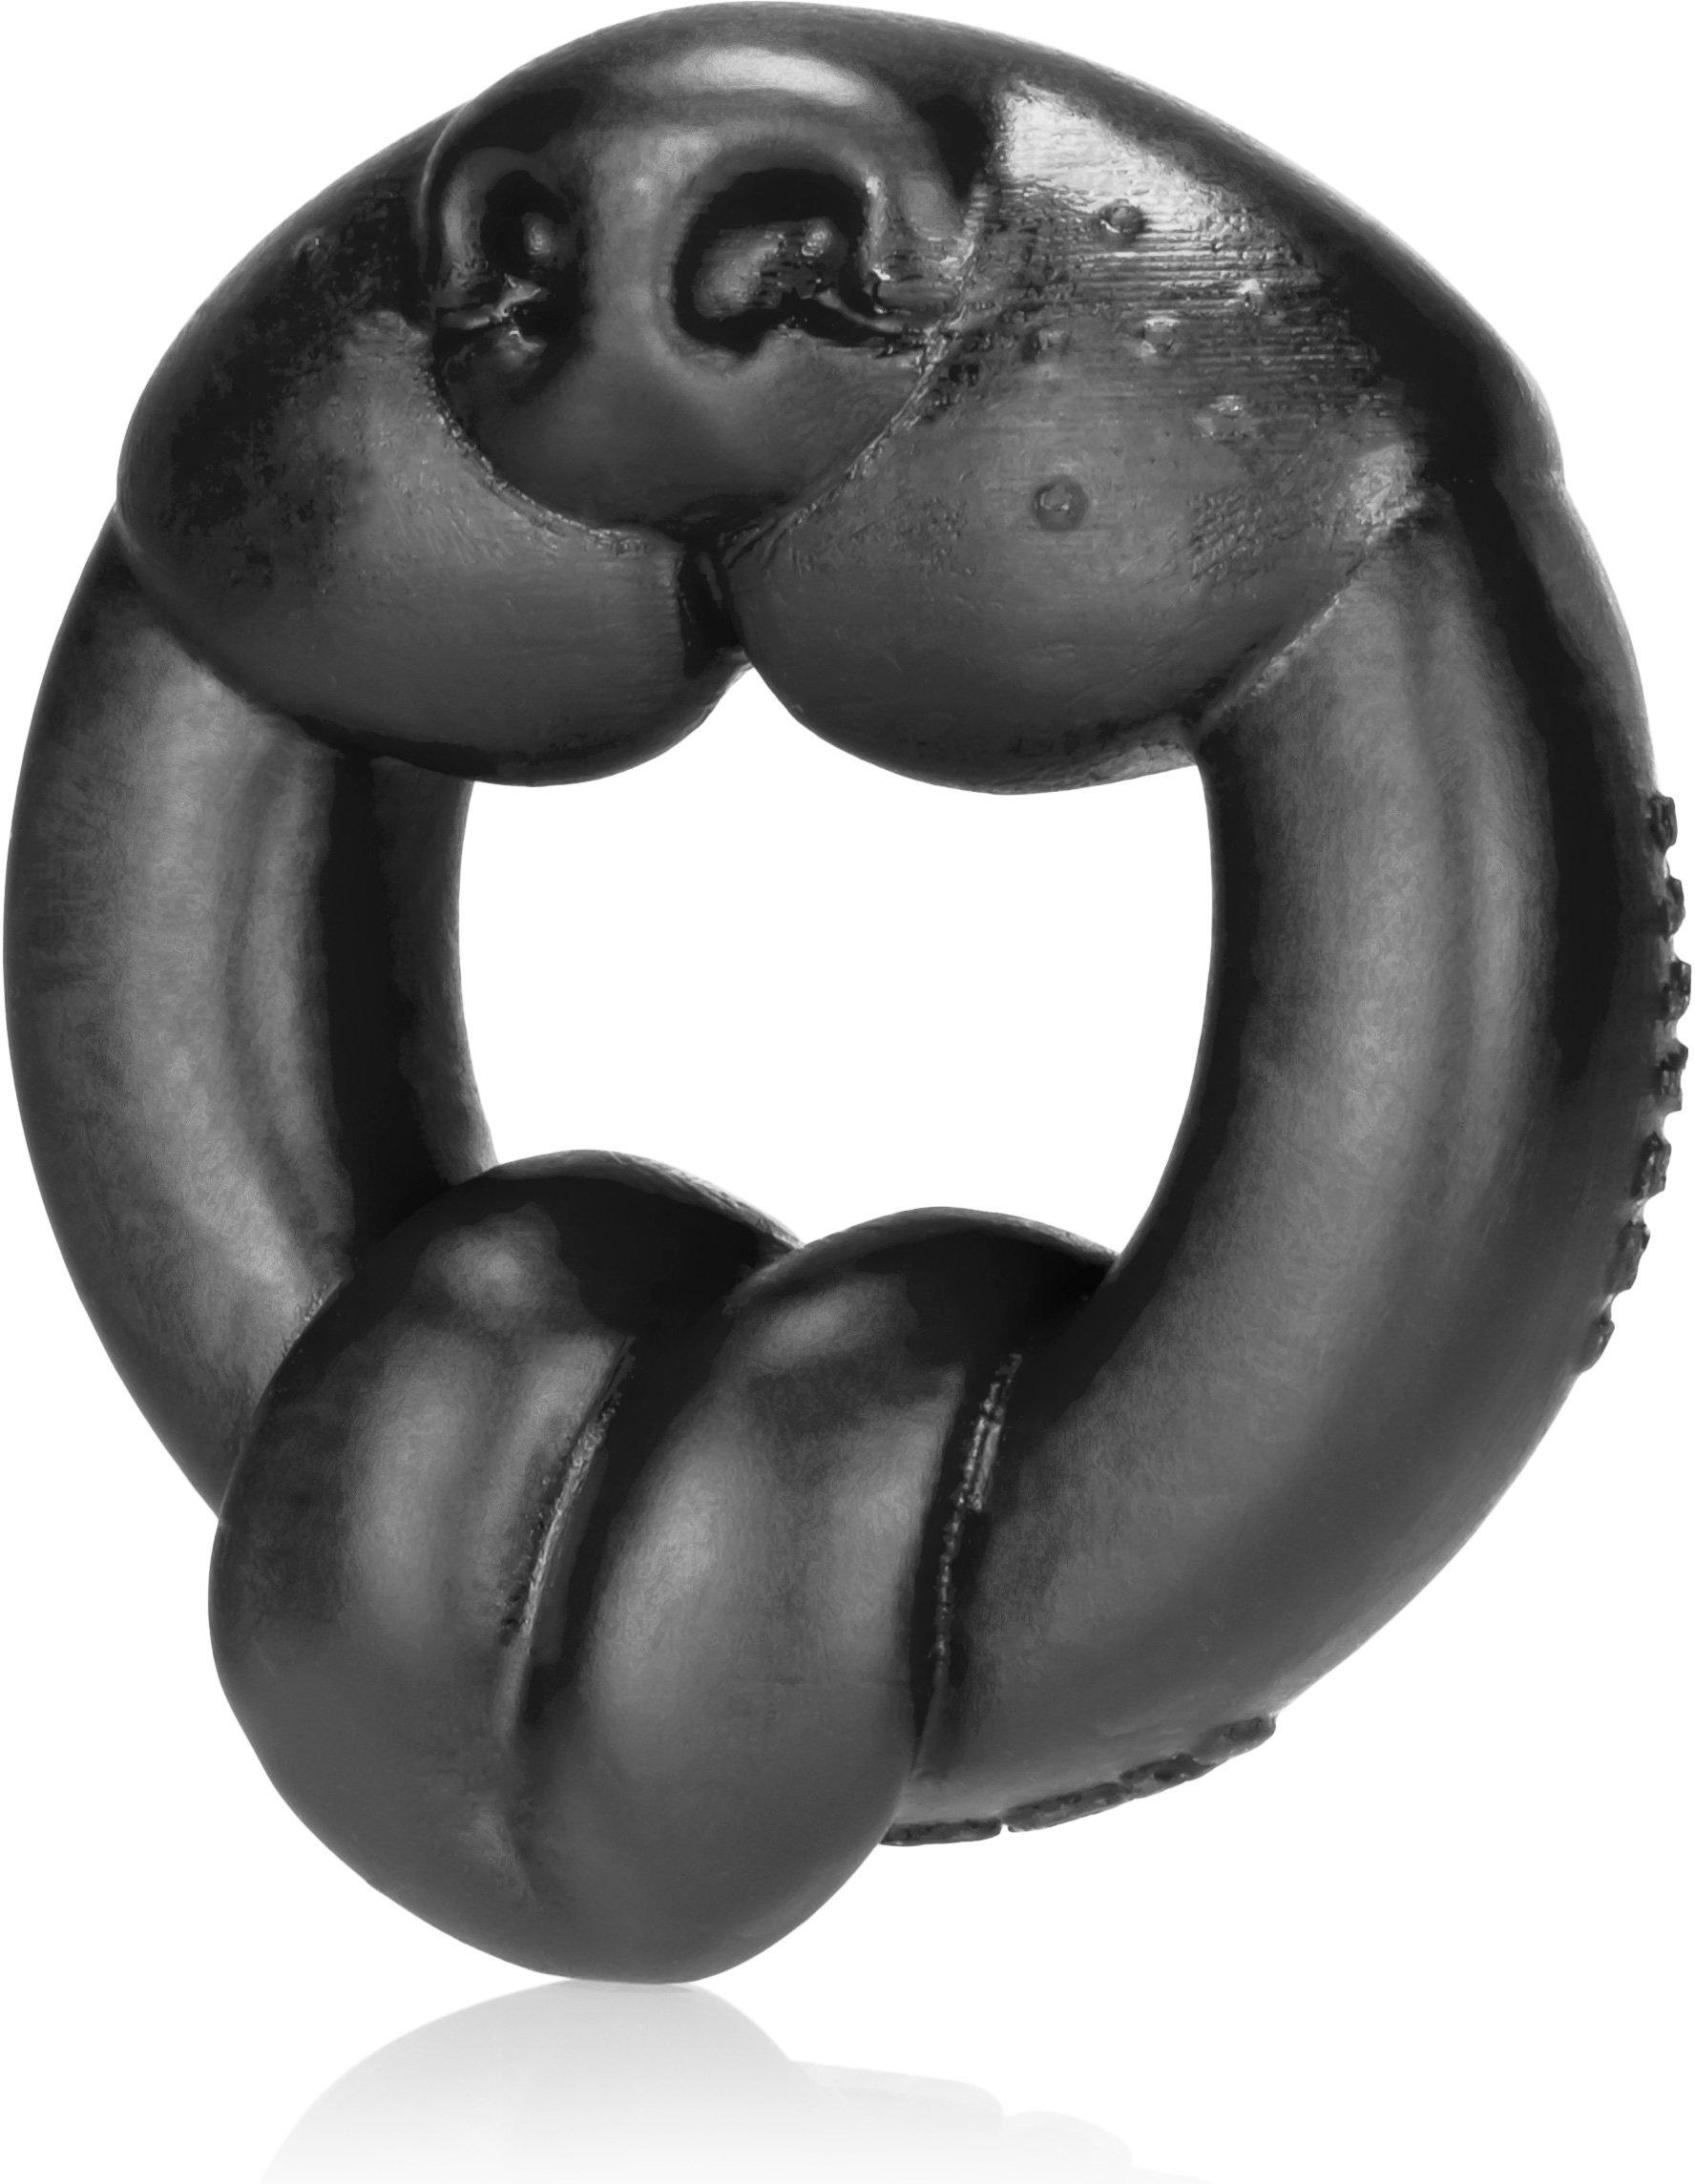 Oxballs Zwart Cock Ring Dog, Black, 67 Gram by Oxballs